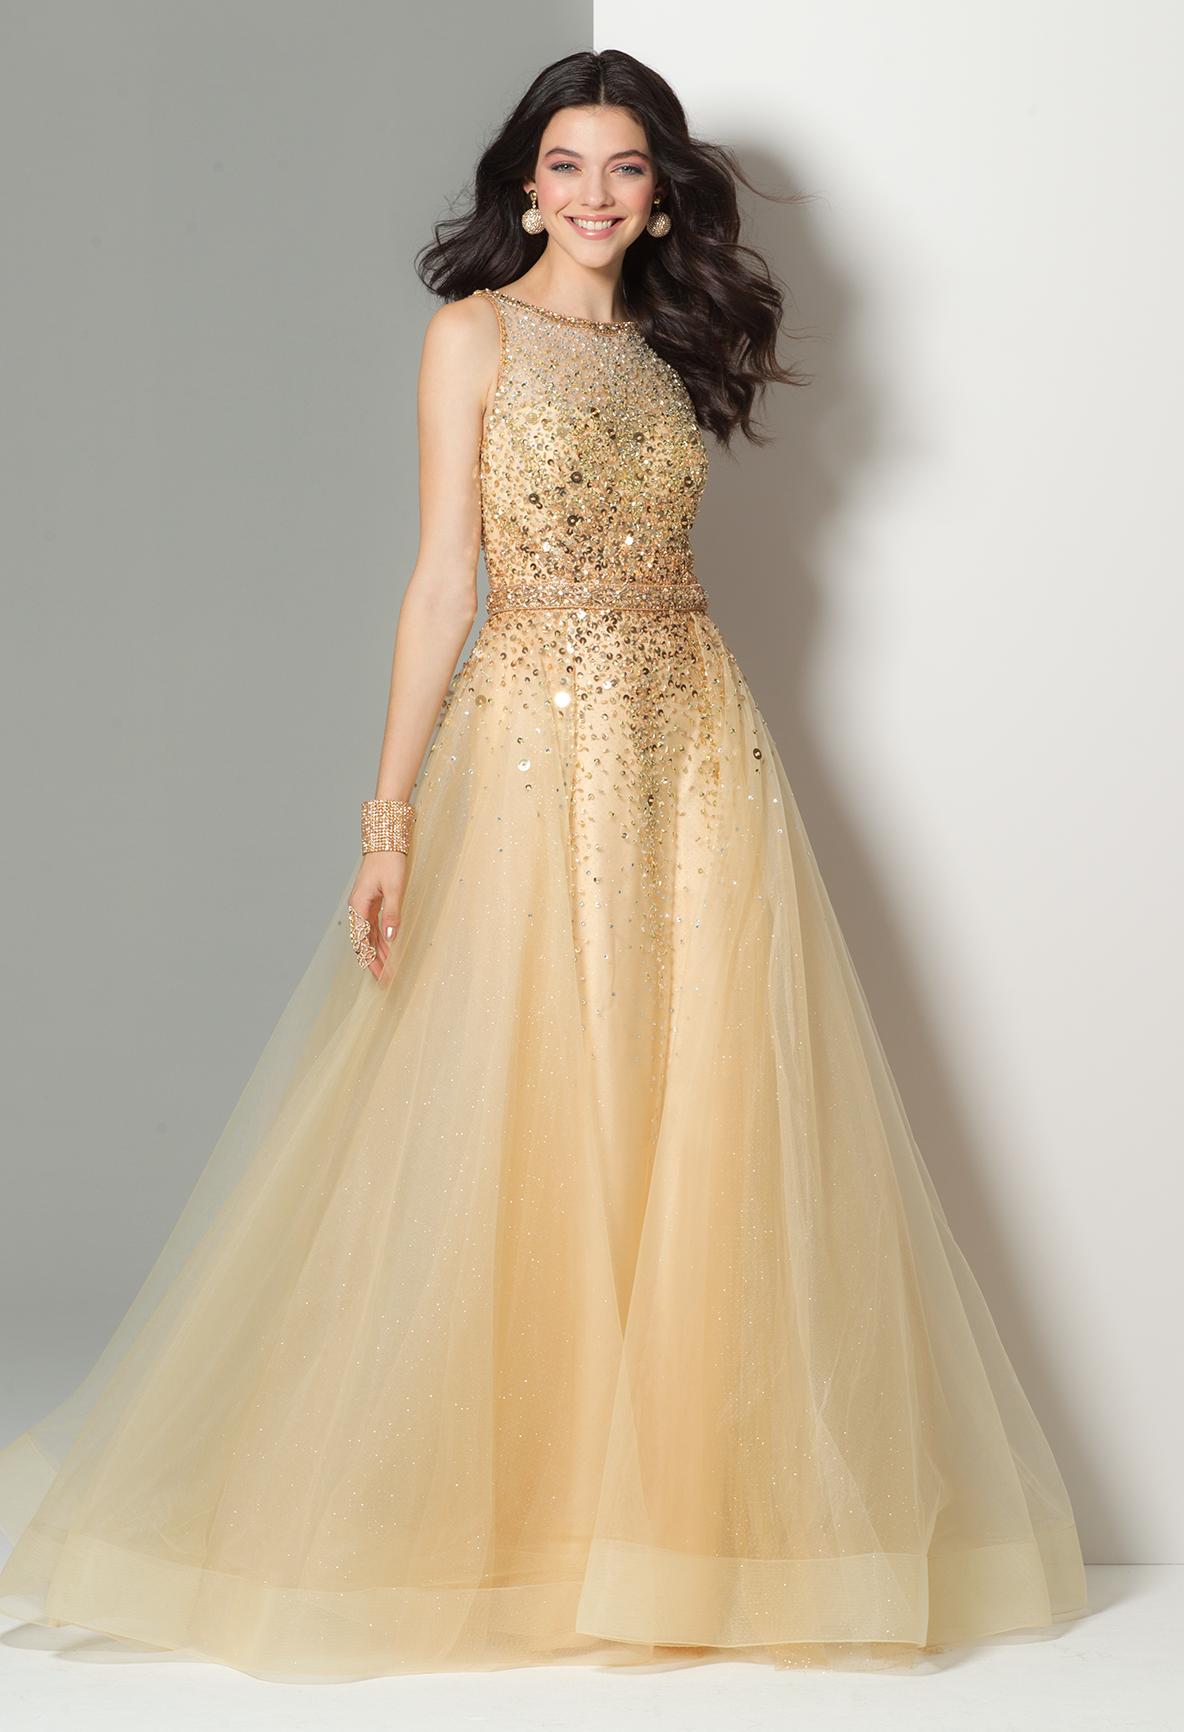 Beaded glitter tulle ballgown